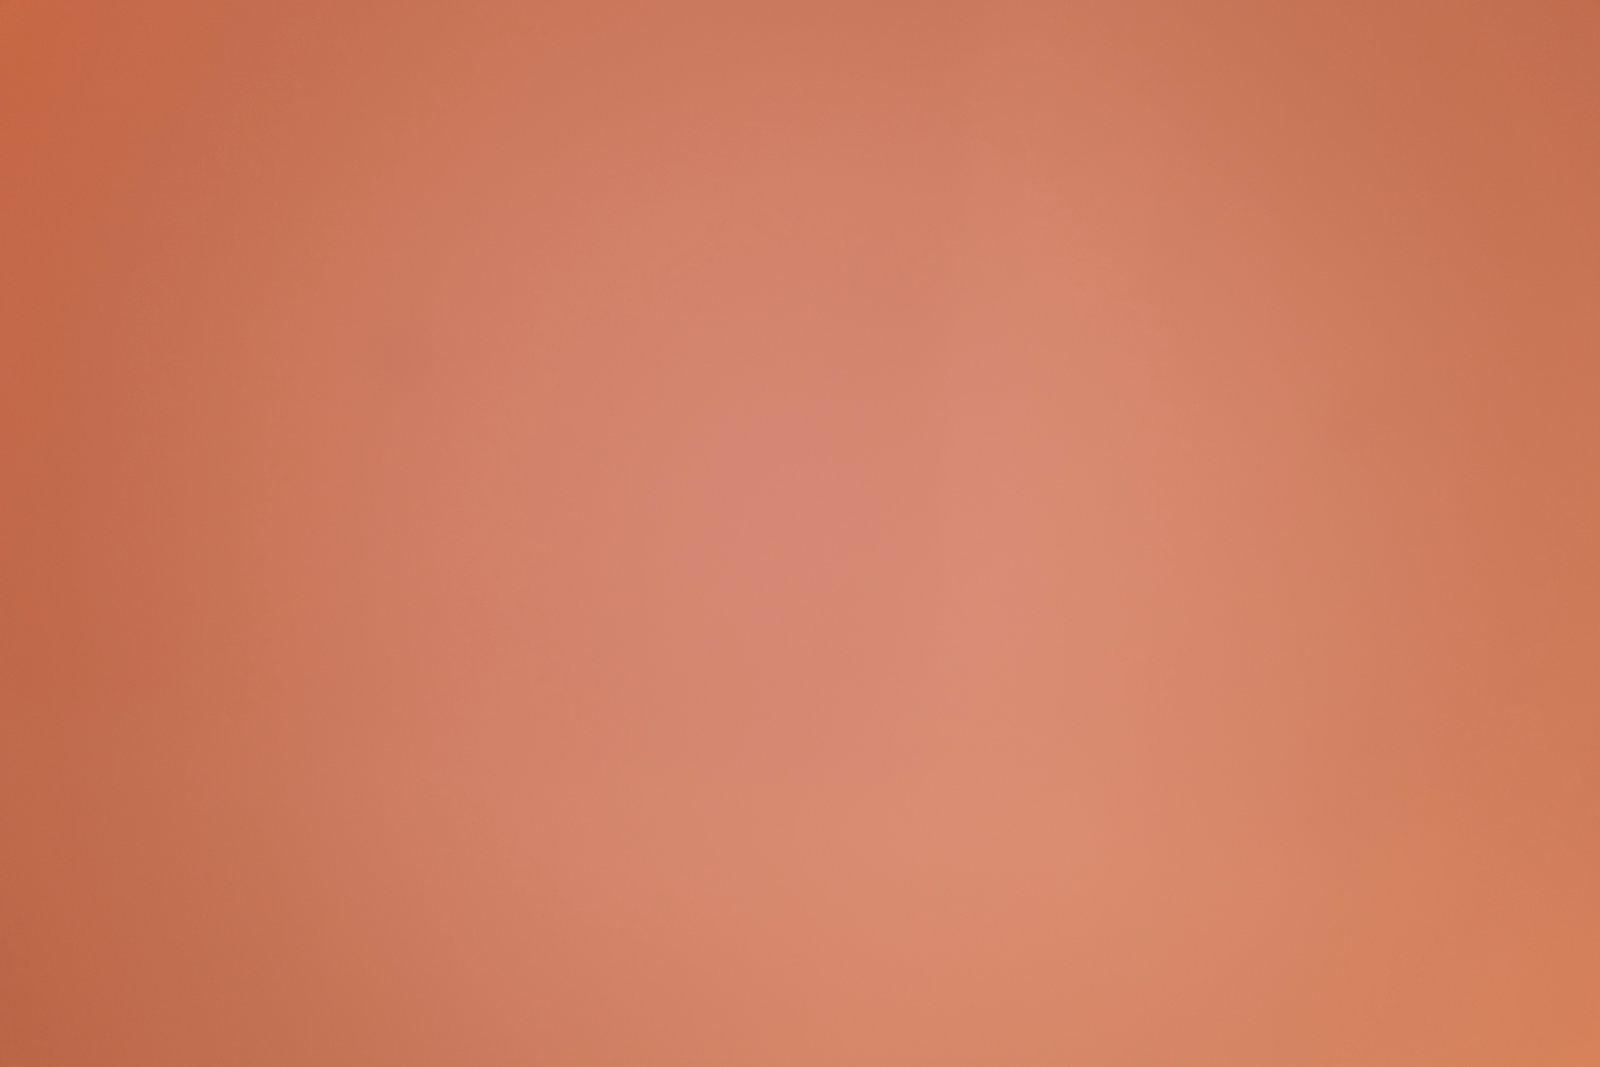 test infrarouge HOTSPOT 24mm F2.8 SIGMA | Pierre-Louis Ferrer | Test du SIGMA 24mm F/1.4 DG HSM Art en photographie infrarouge | Partie 1